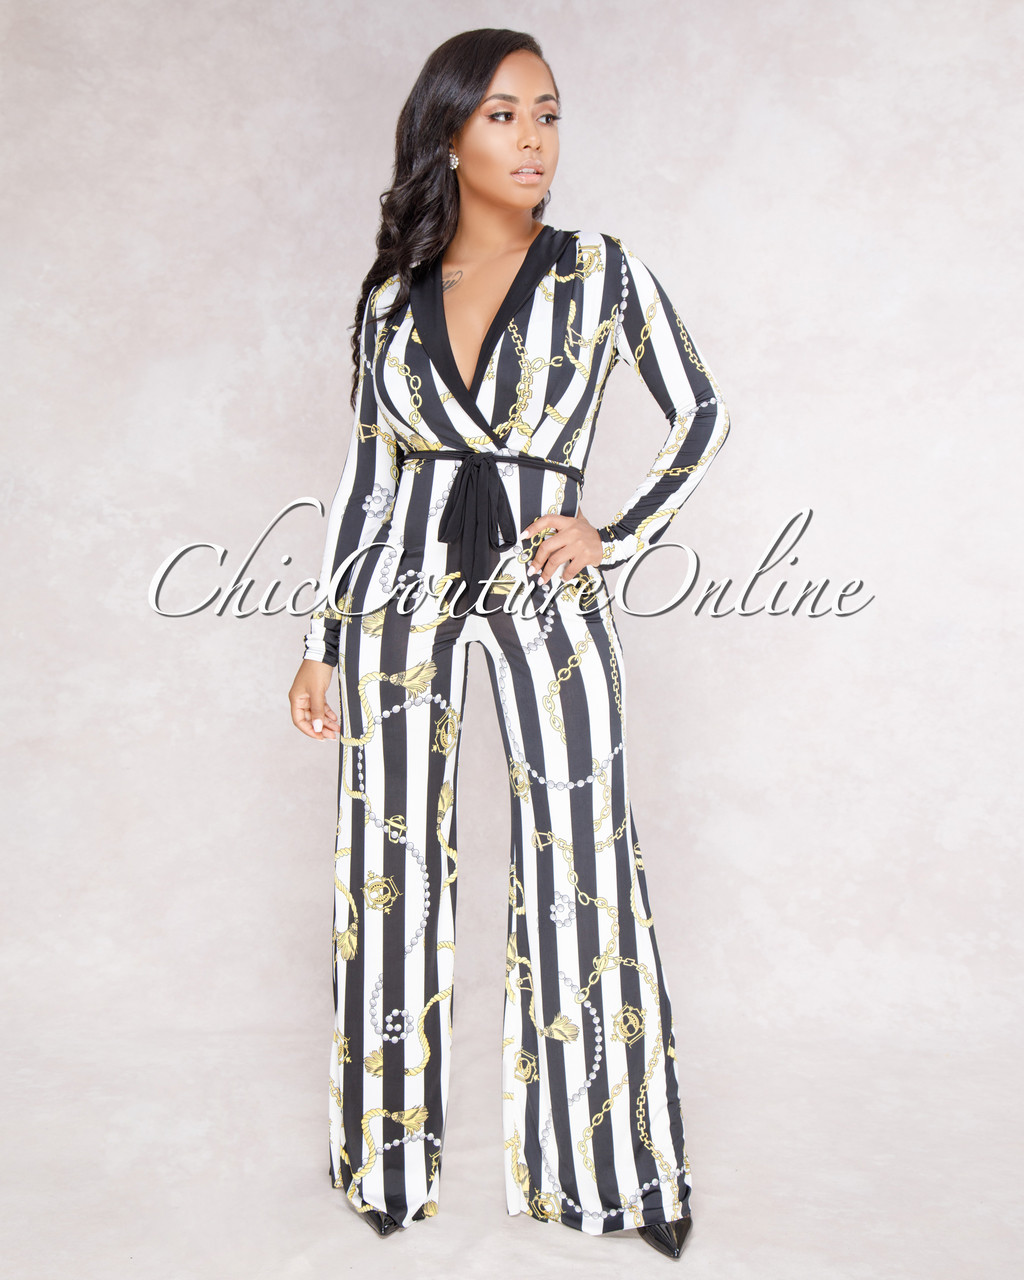 Malu Black White Gold Chain Print Jumpsuit